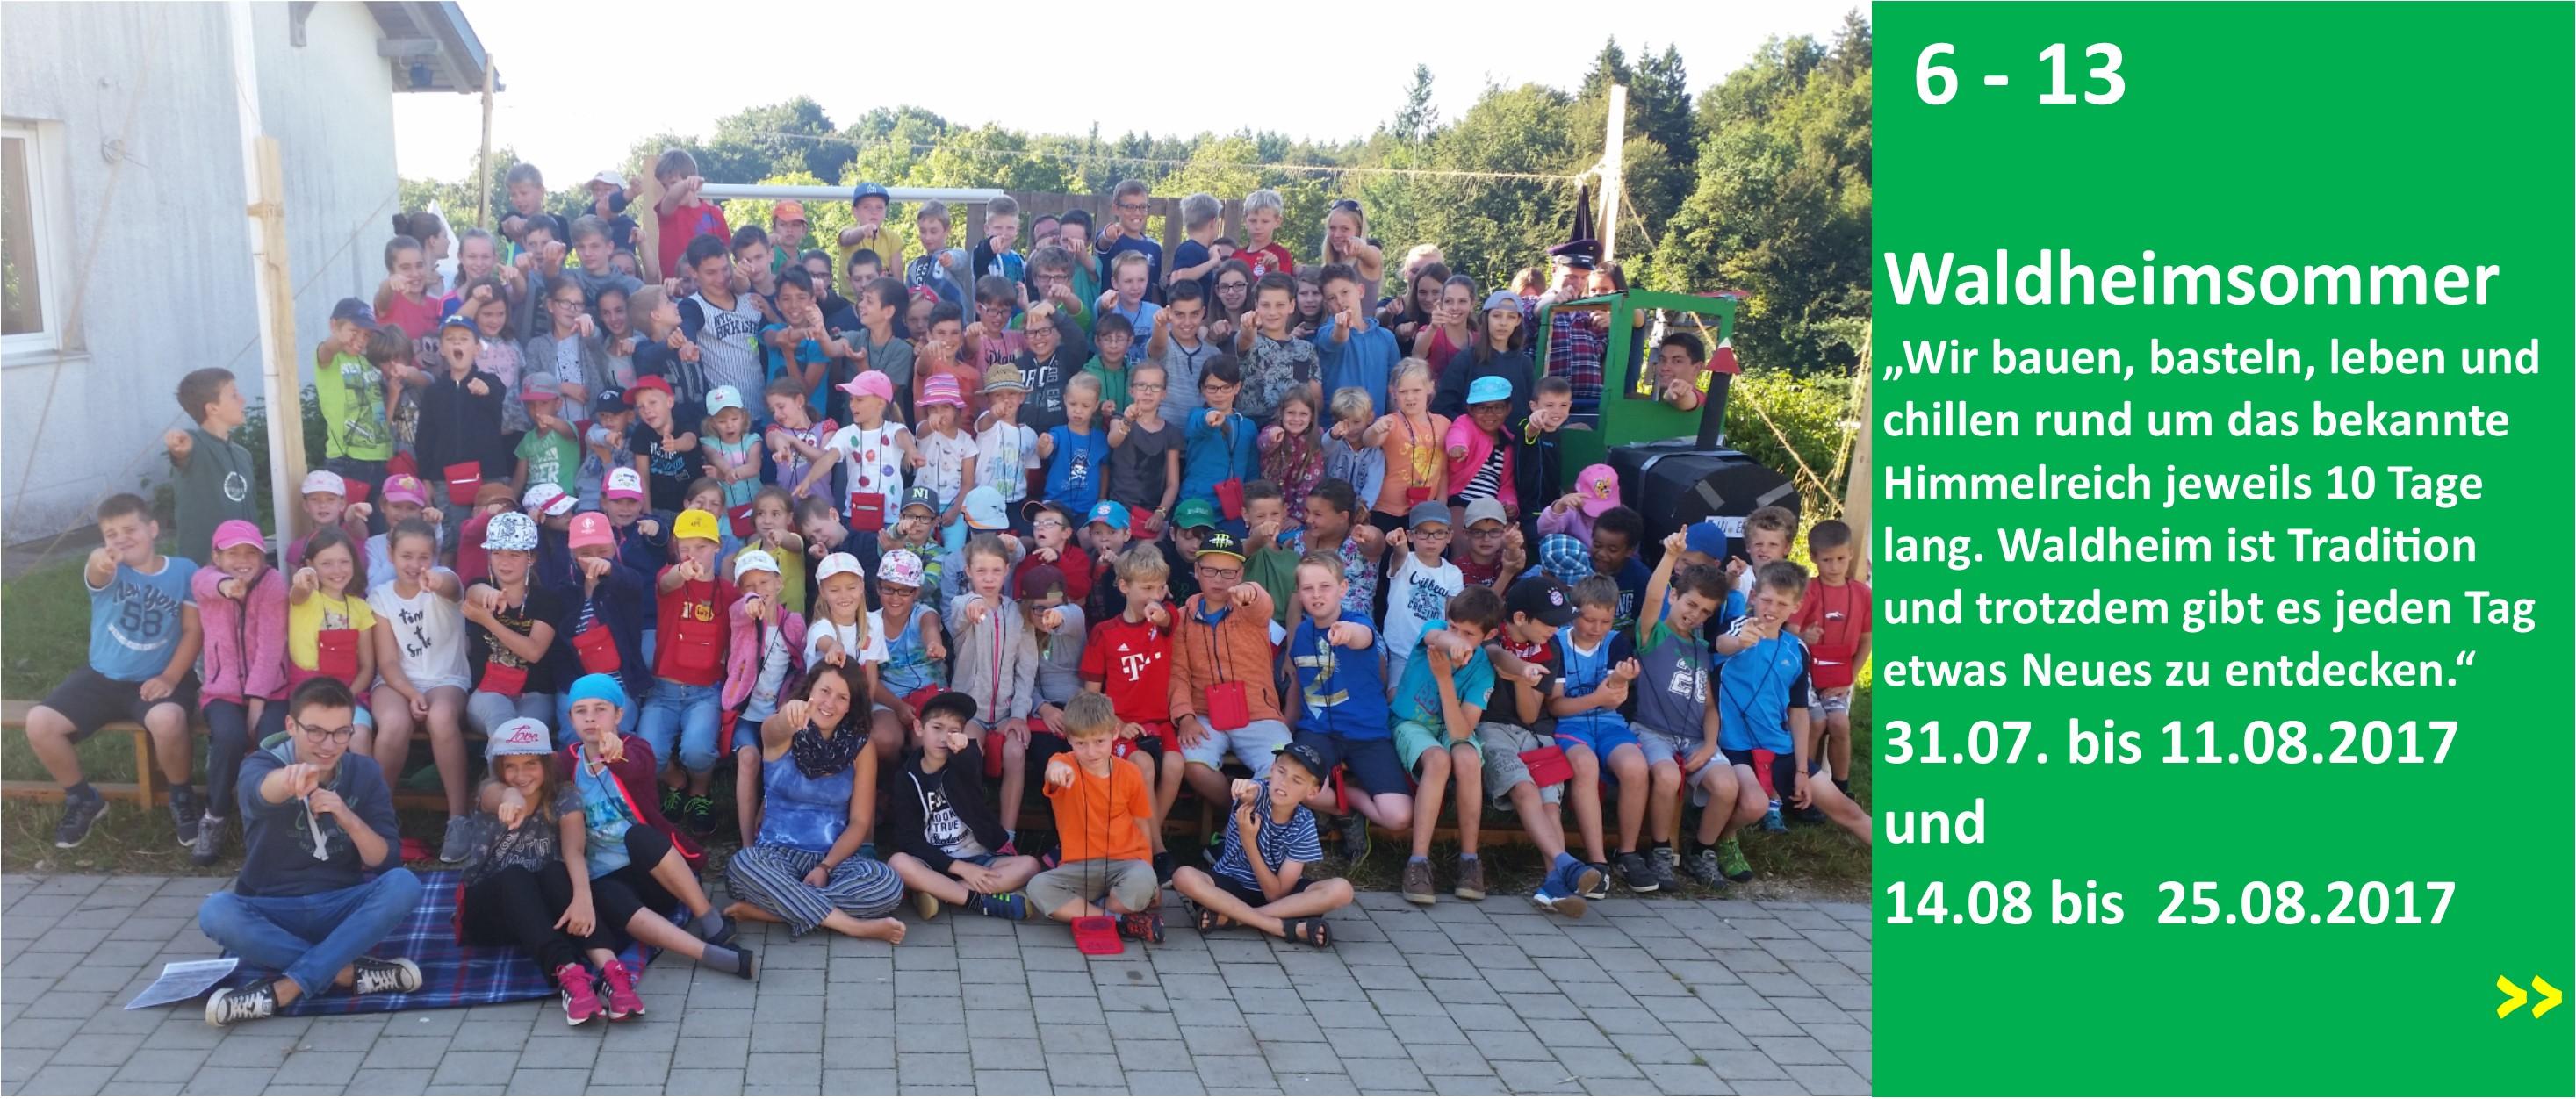 waldheim_titel_2017